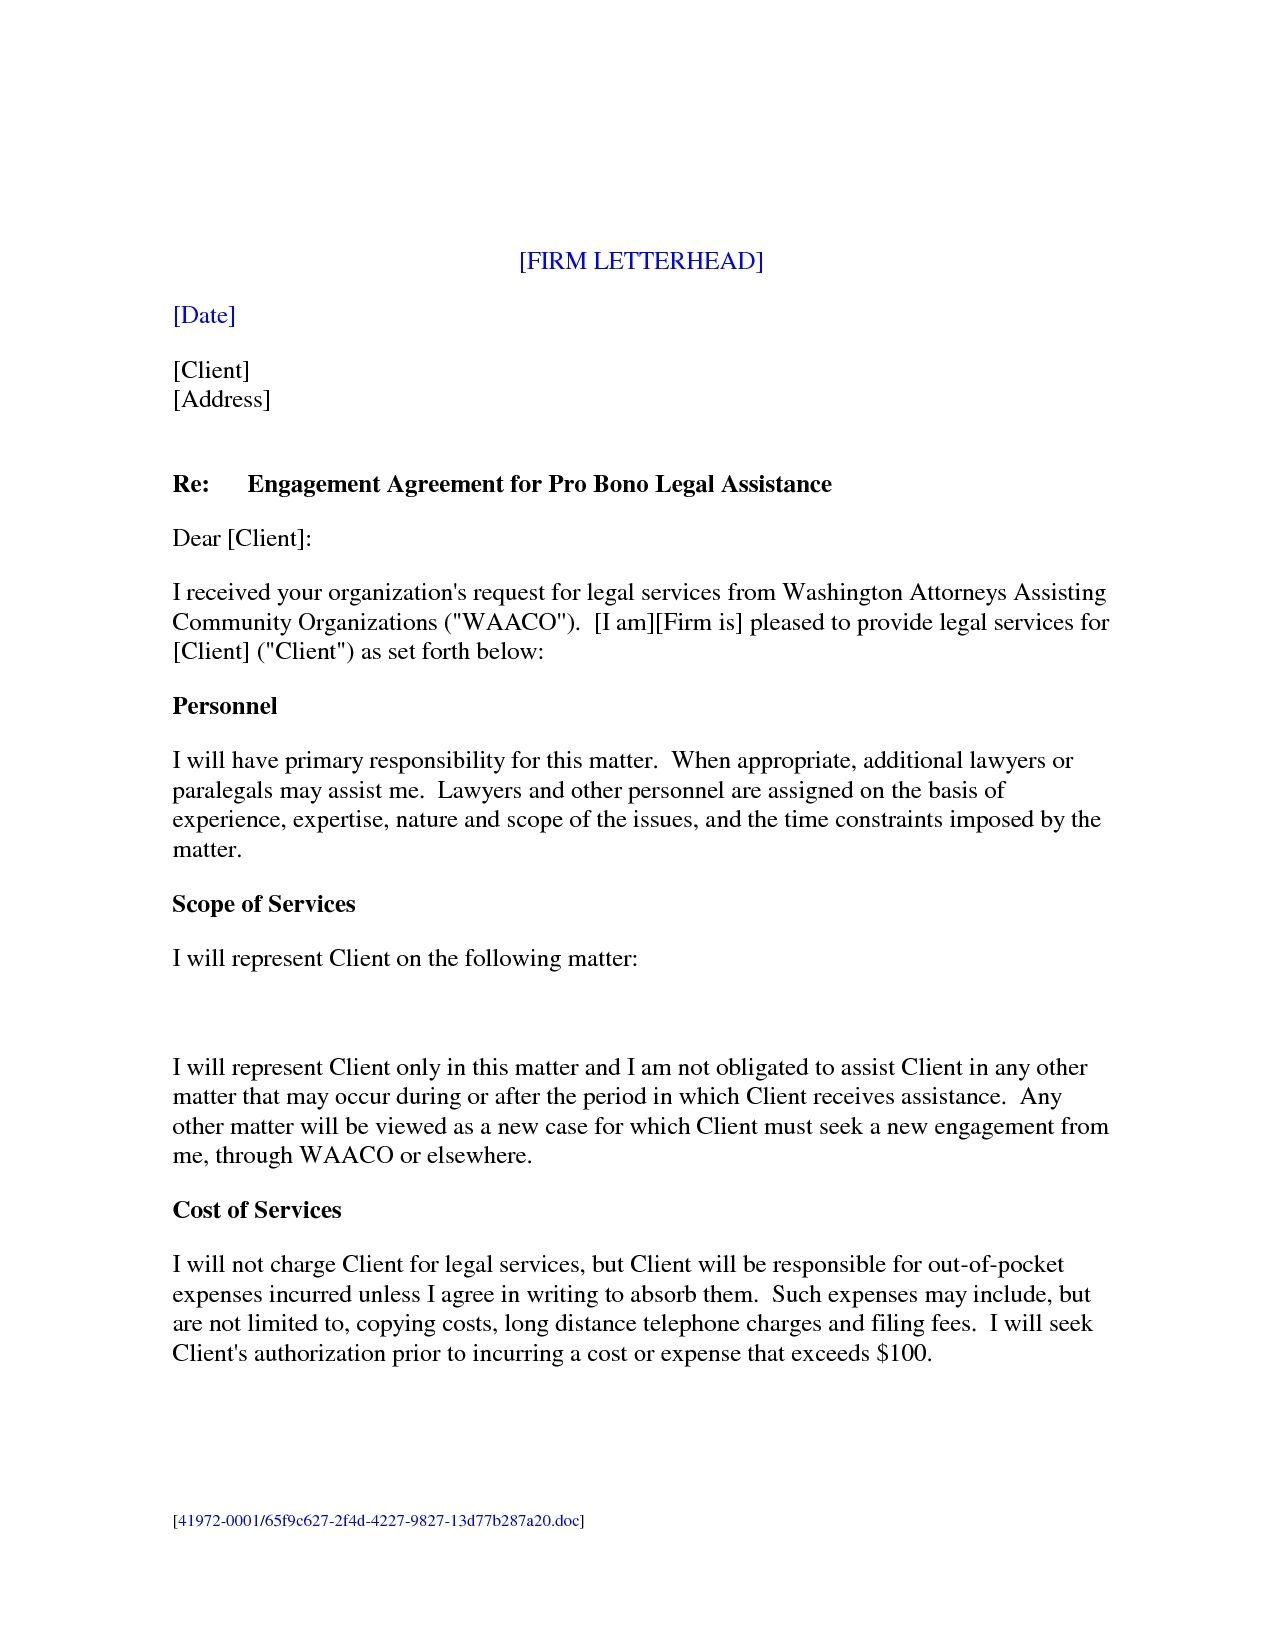 Sle Letter Format For Attorney Client Ingyenoltoztetosjatekok